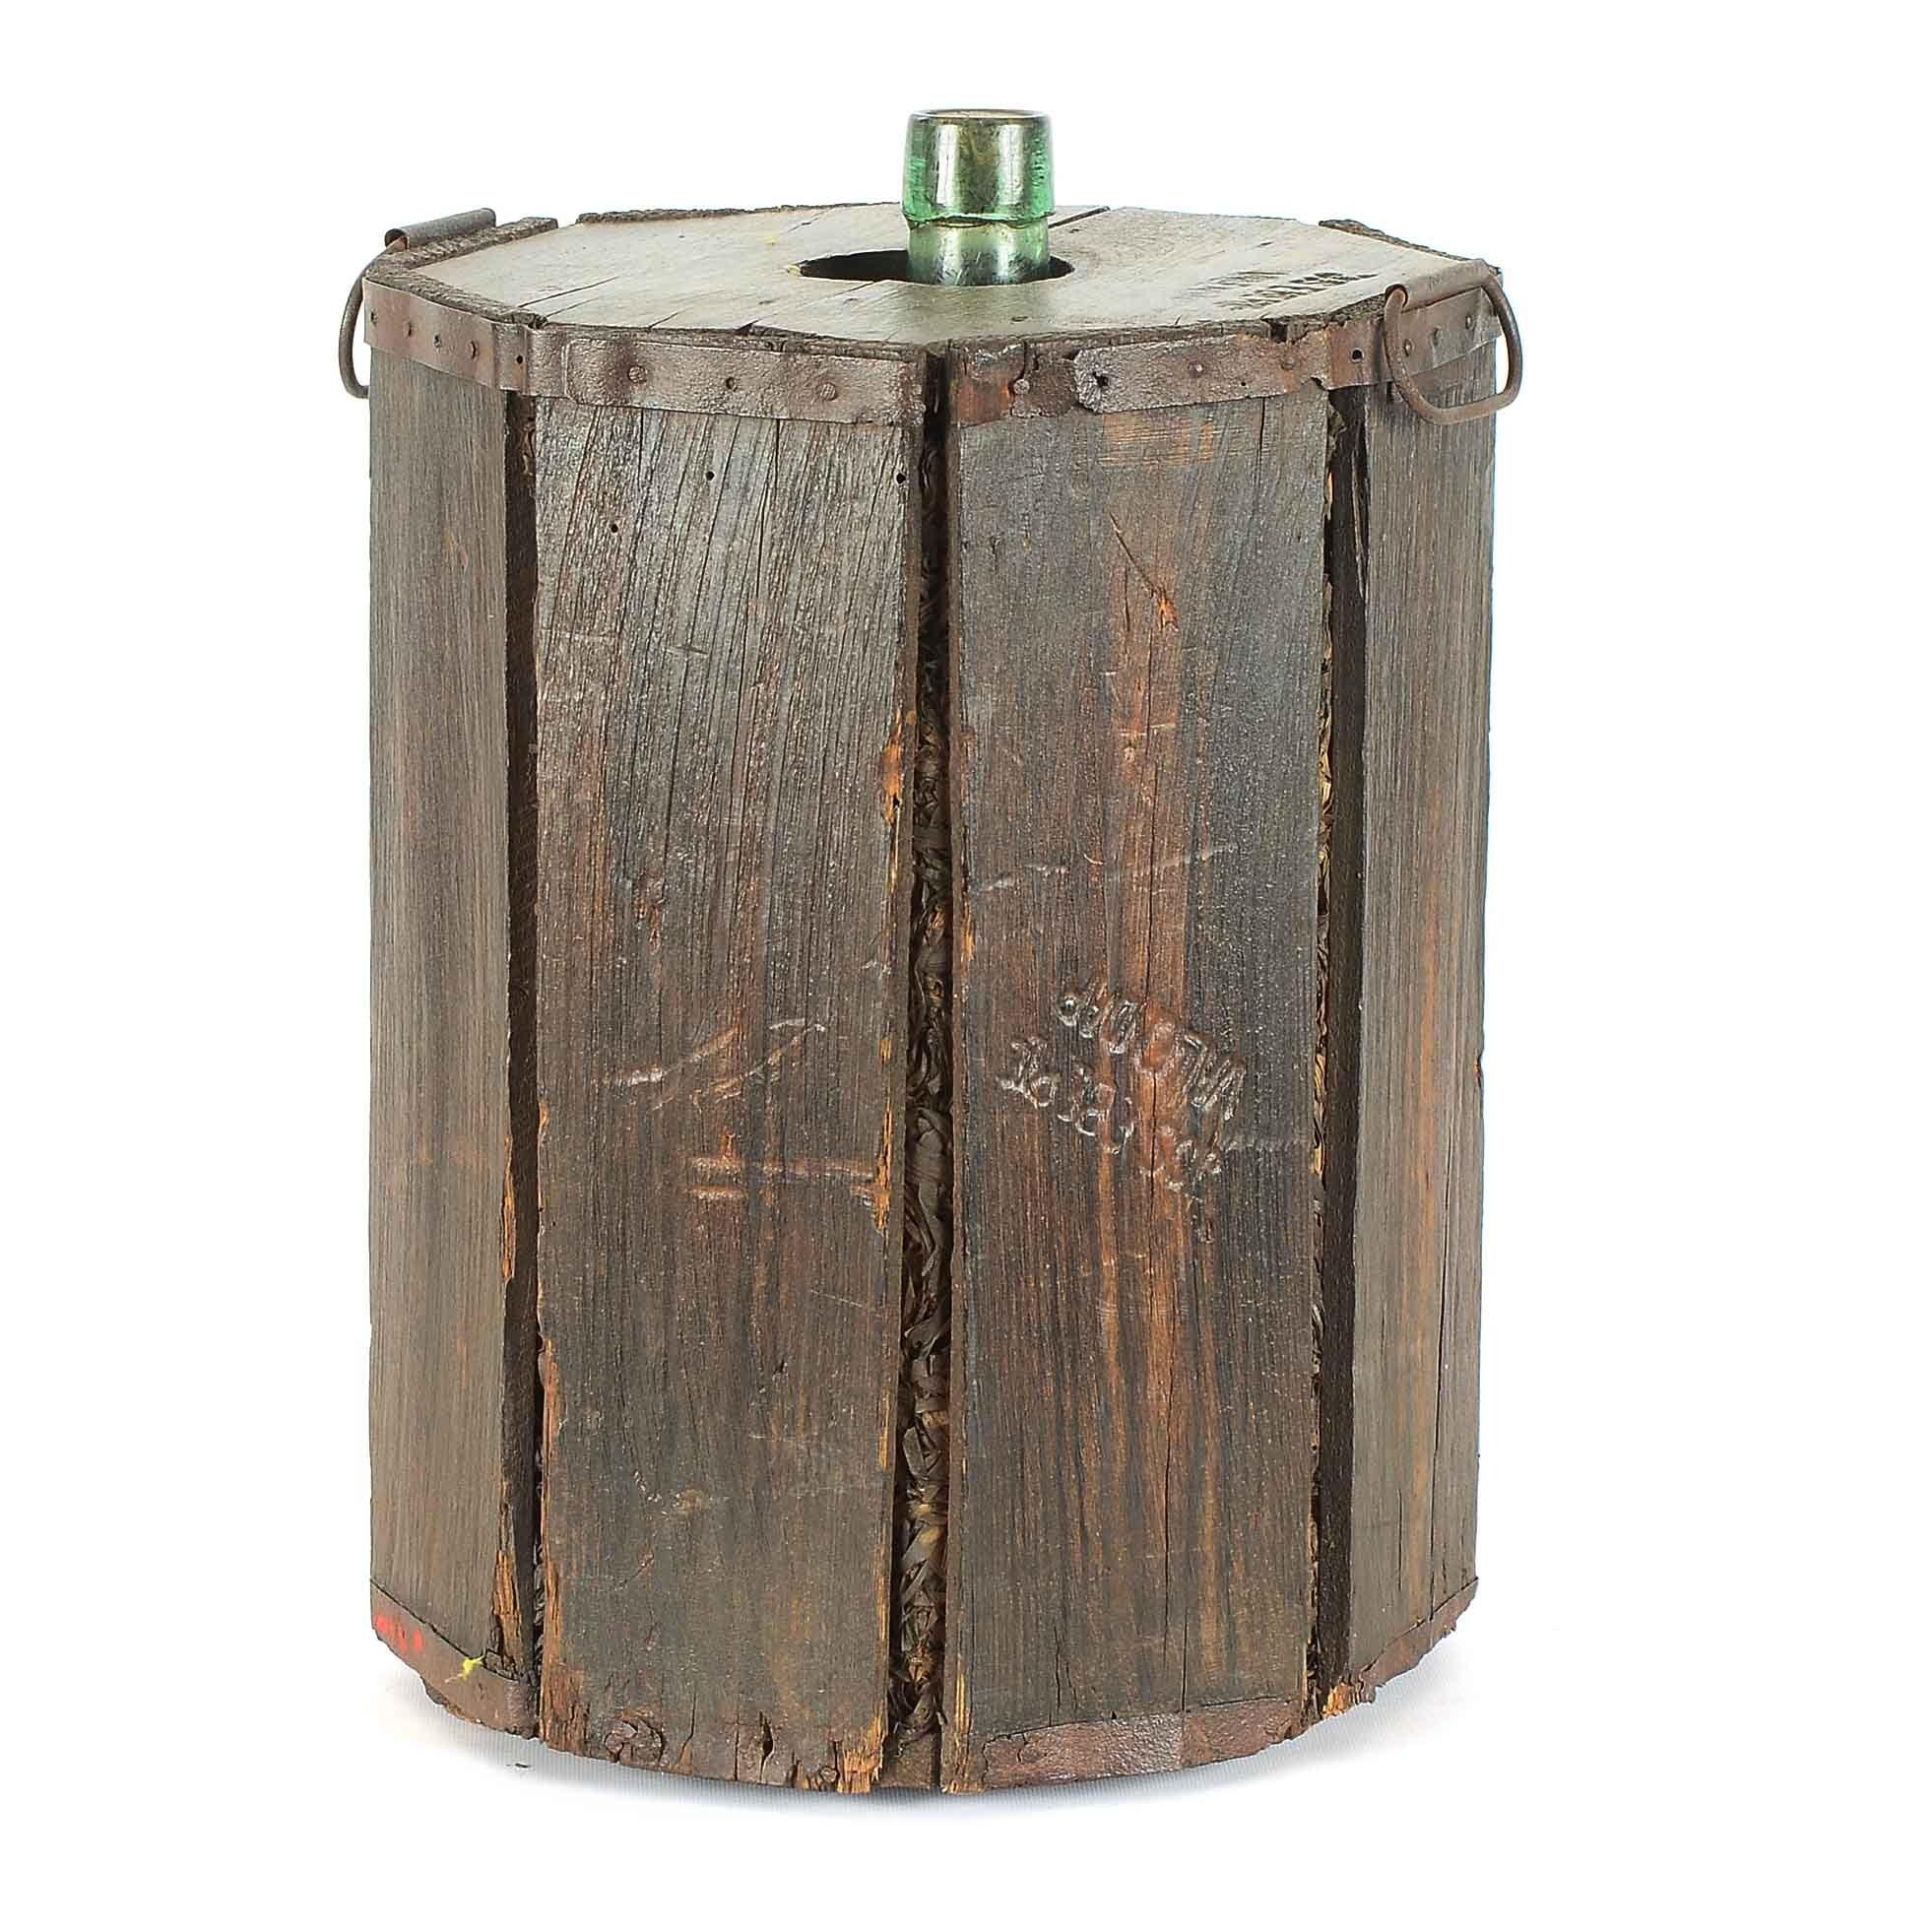 Large Vintage Bottle in Stamped Wooden Shipping Cask